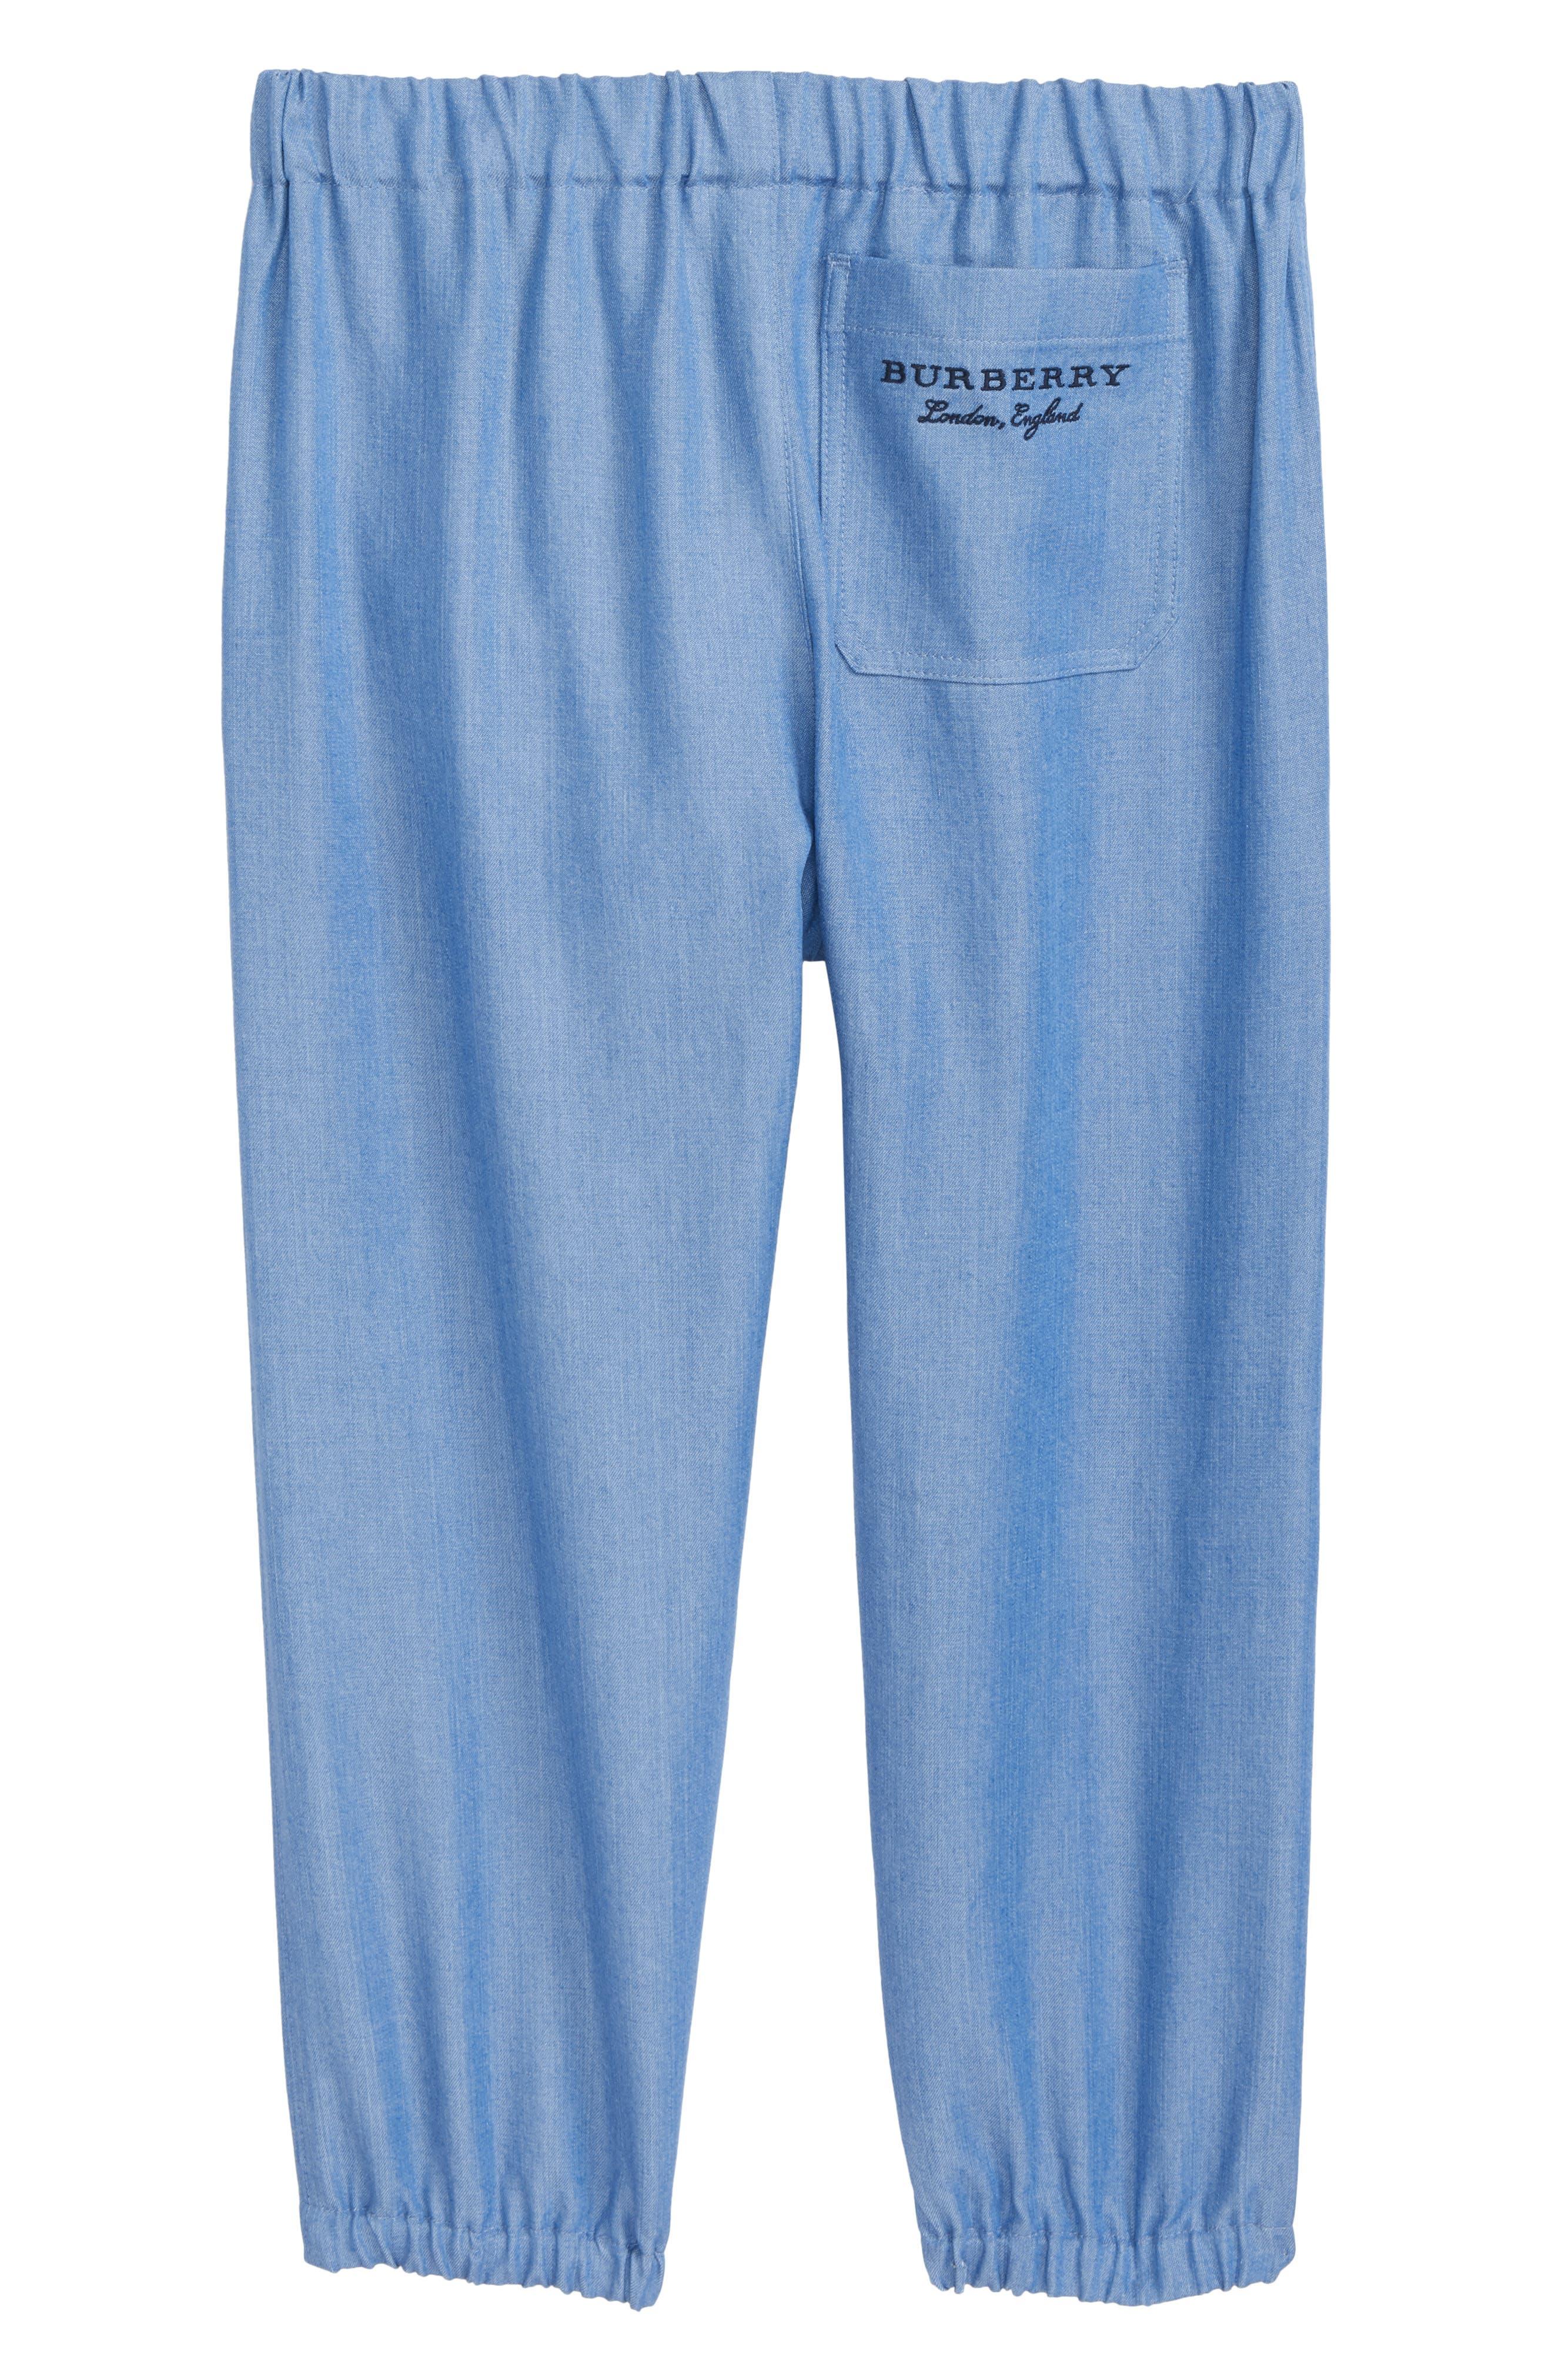 Phillie Chambray Pants,                             Alternate thumbnail 2, color,                             Steel Blue